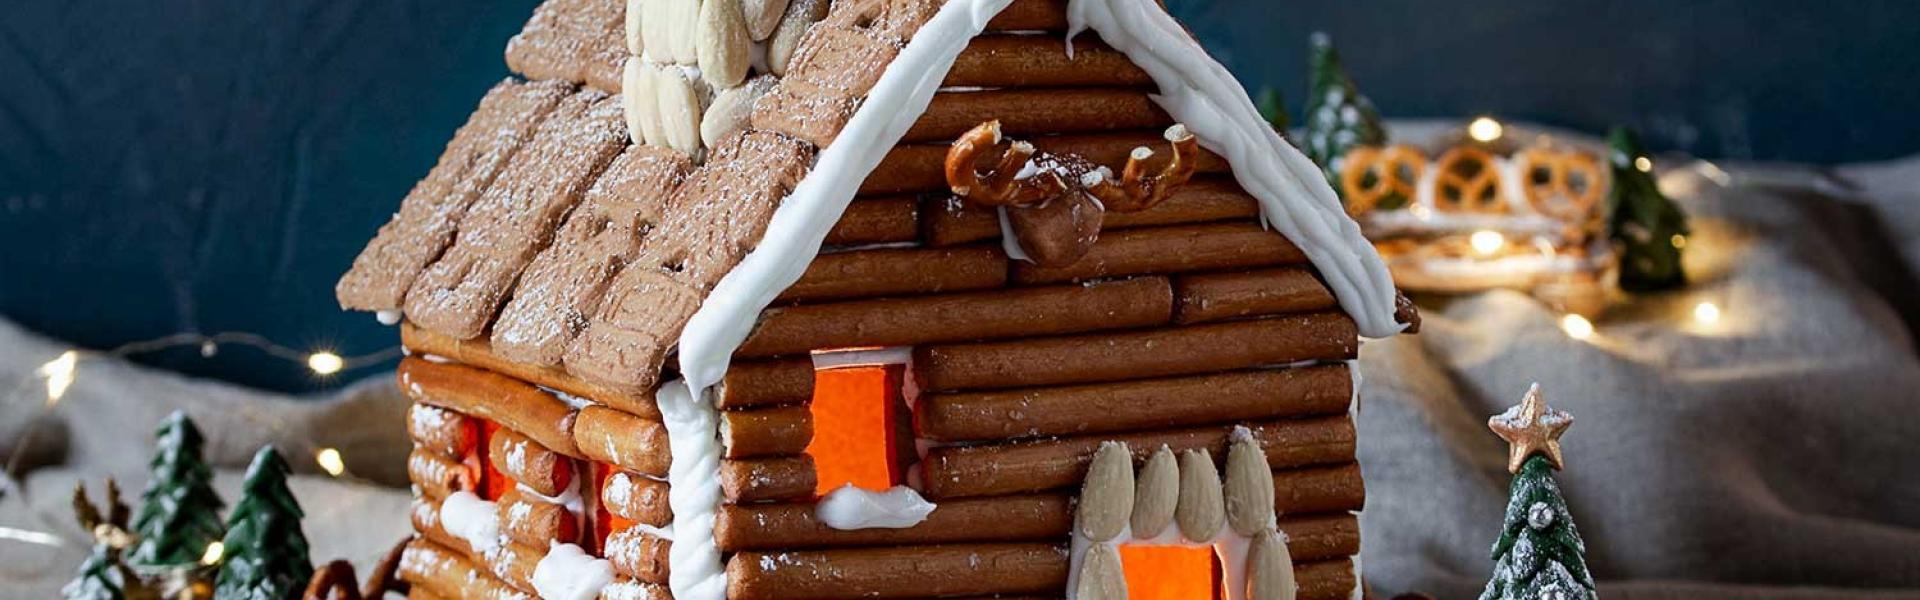 Lebkuchenhütte in winterlichem Setting.